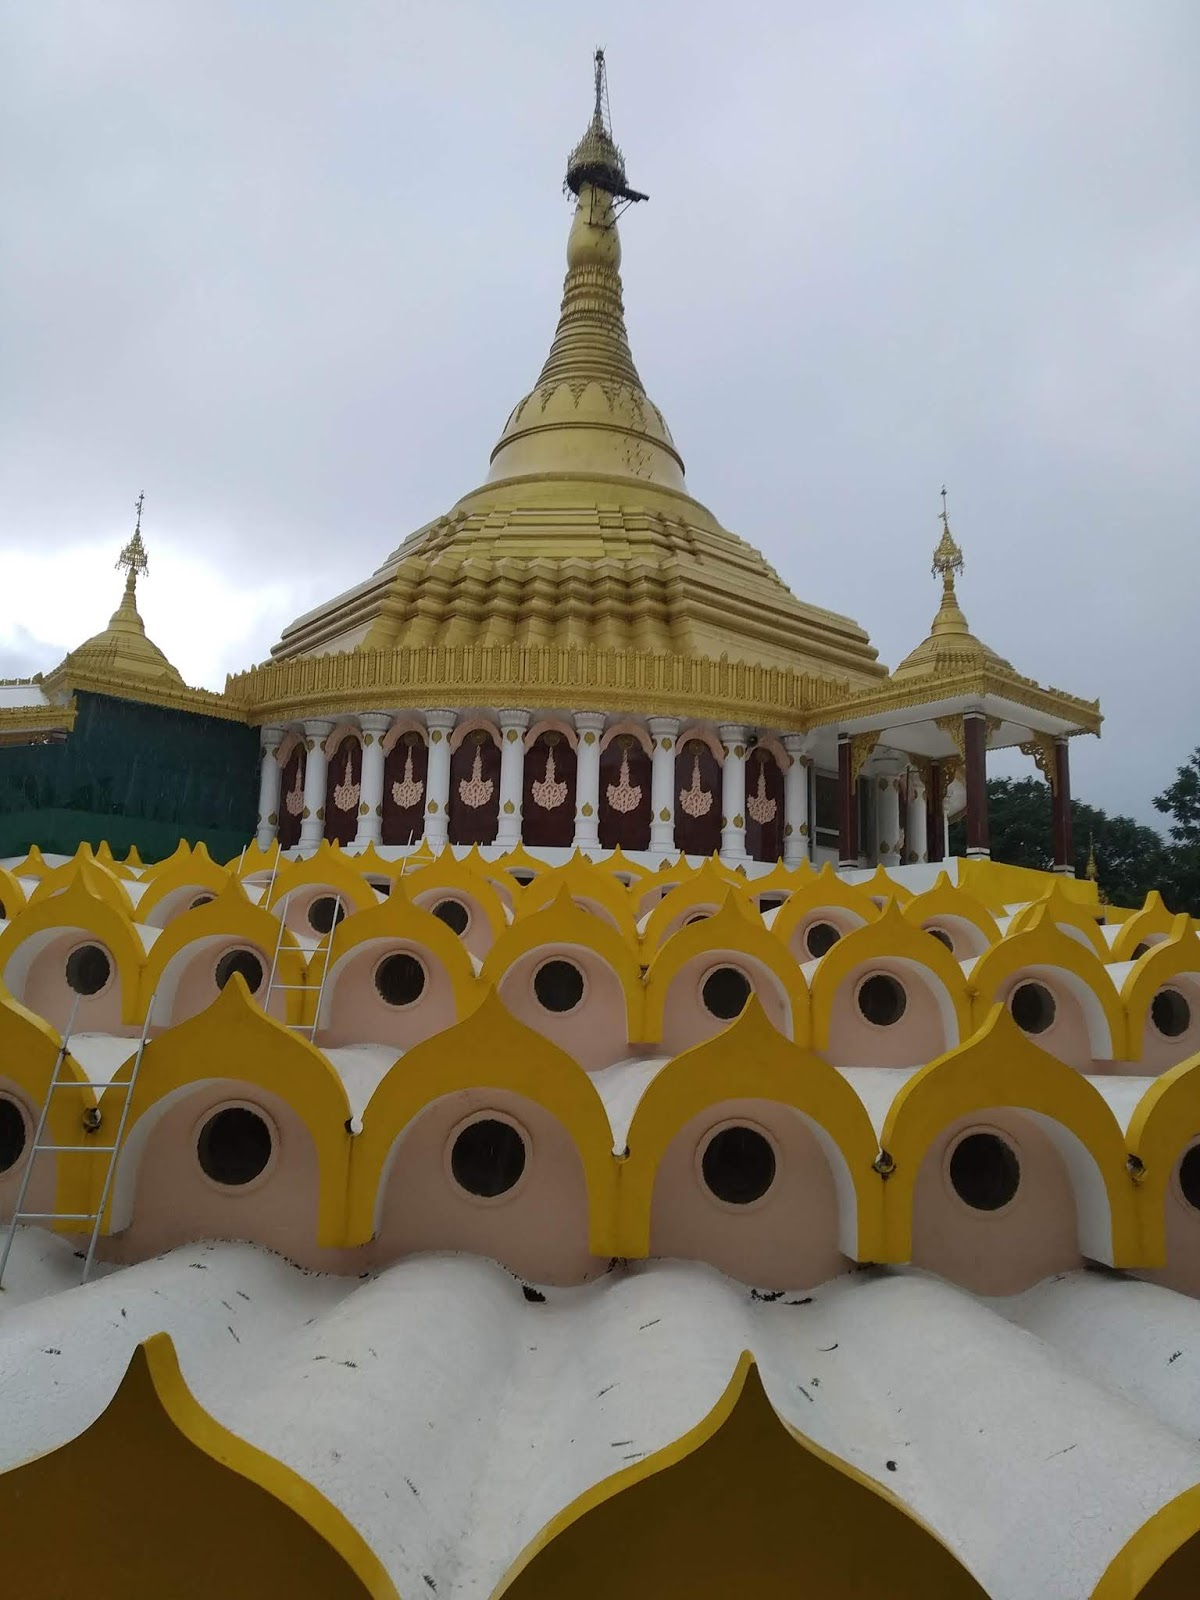 ThinkSathya - tales fm 2006 onwards, chronicles my innocent